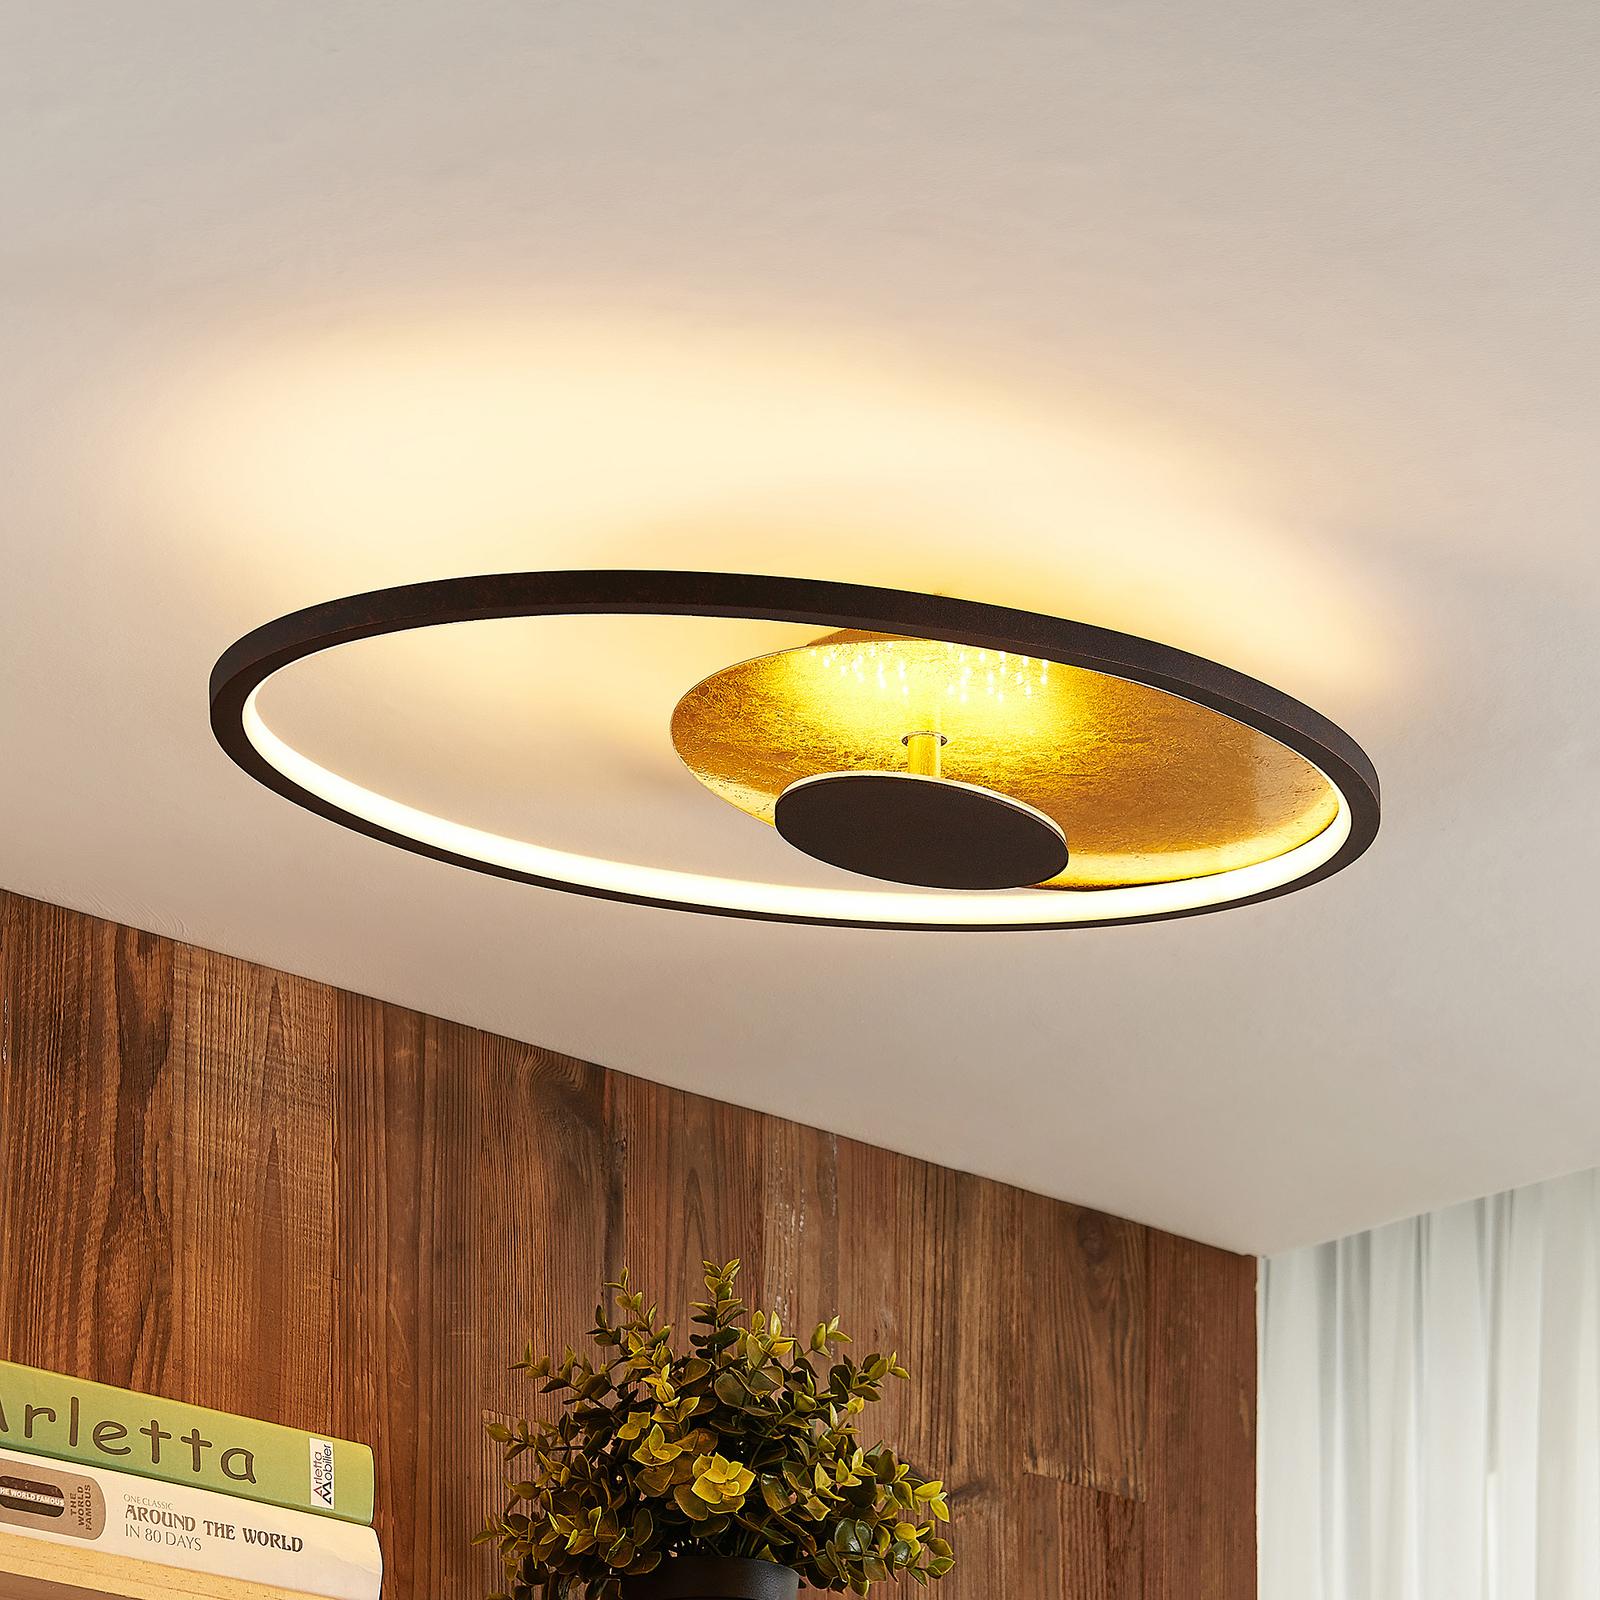 Lindby Fevial LED-taklampa, 61 cm x 36 cm